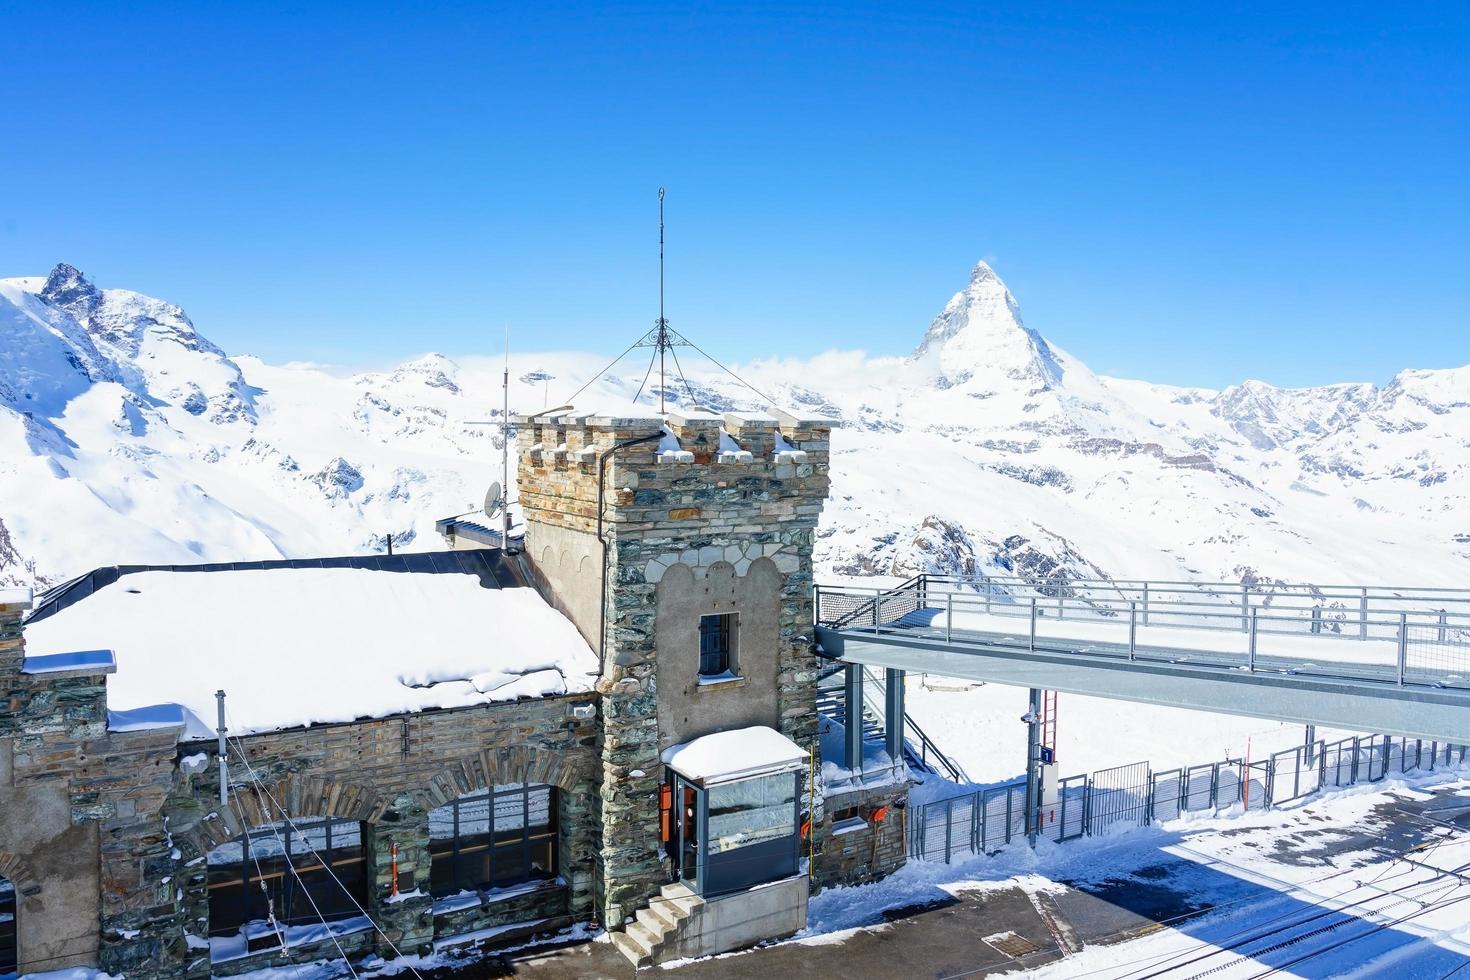 l'observatoire du sommet du Gornergrat, suisse, 2018 photo